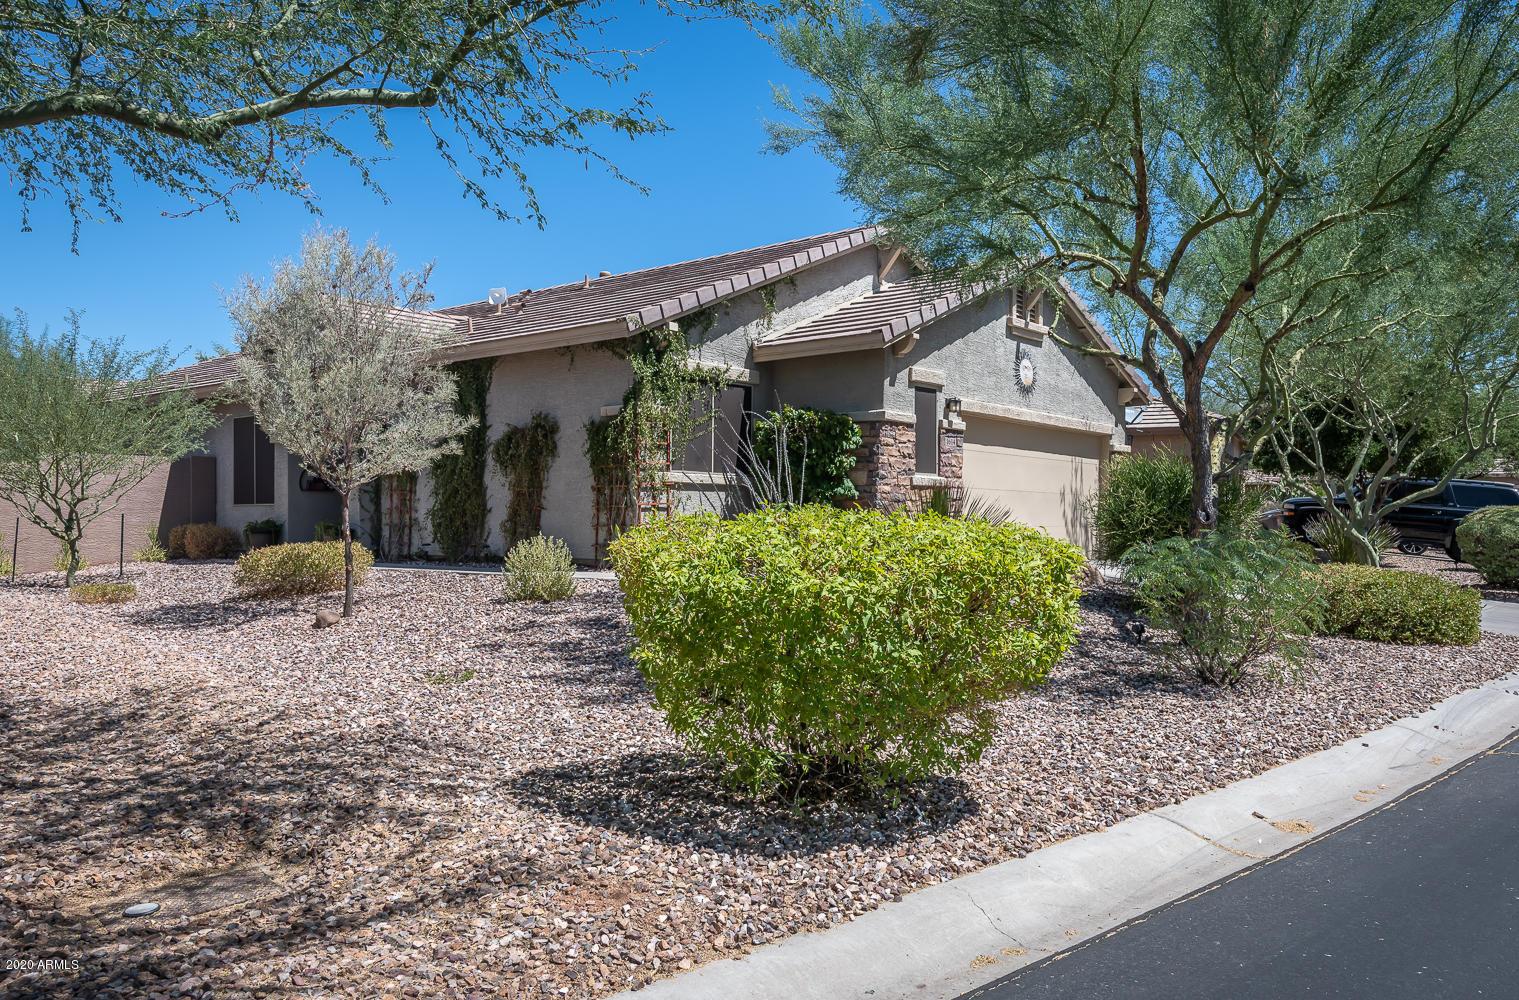 Anthem Az News And Homes For Sale Arizona Ehomes